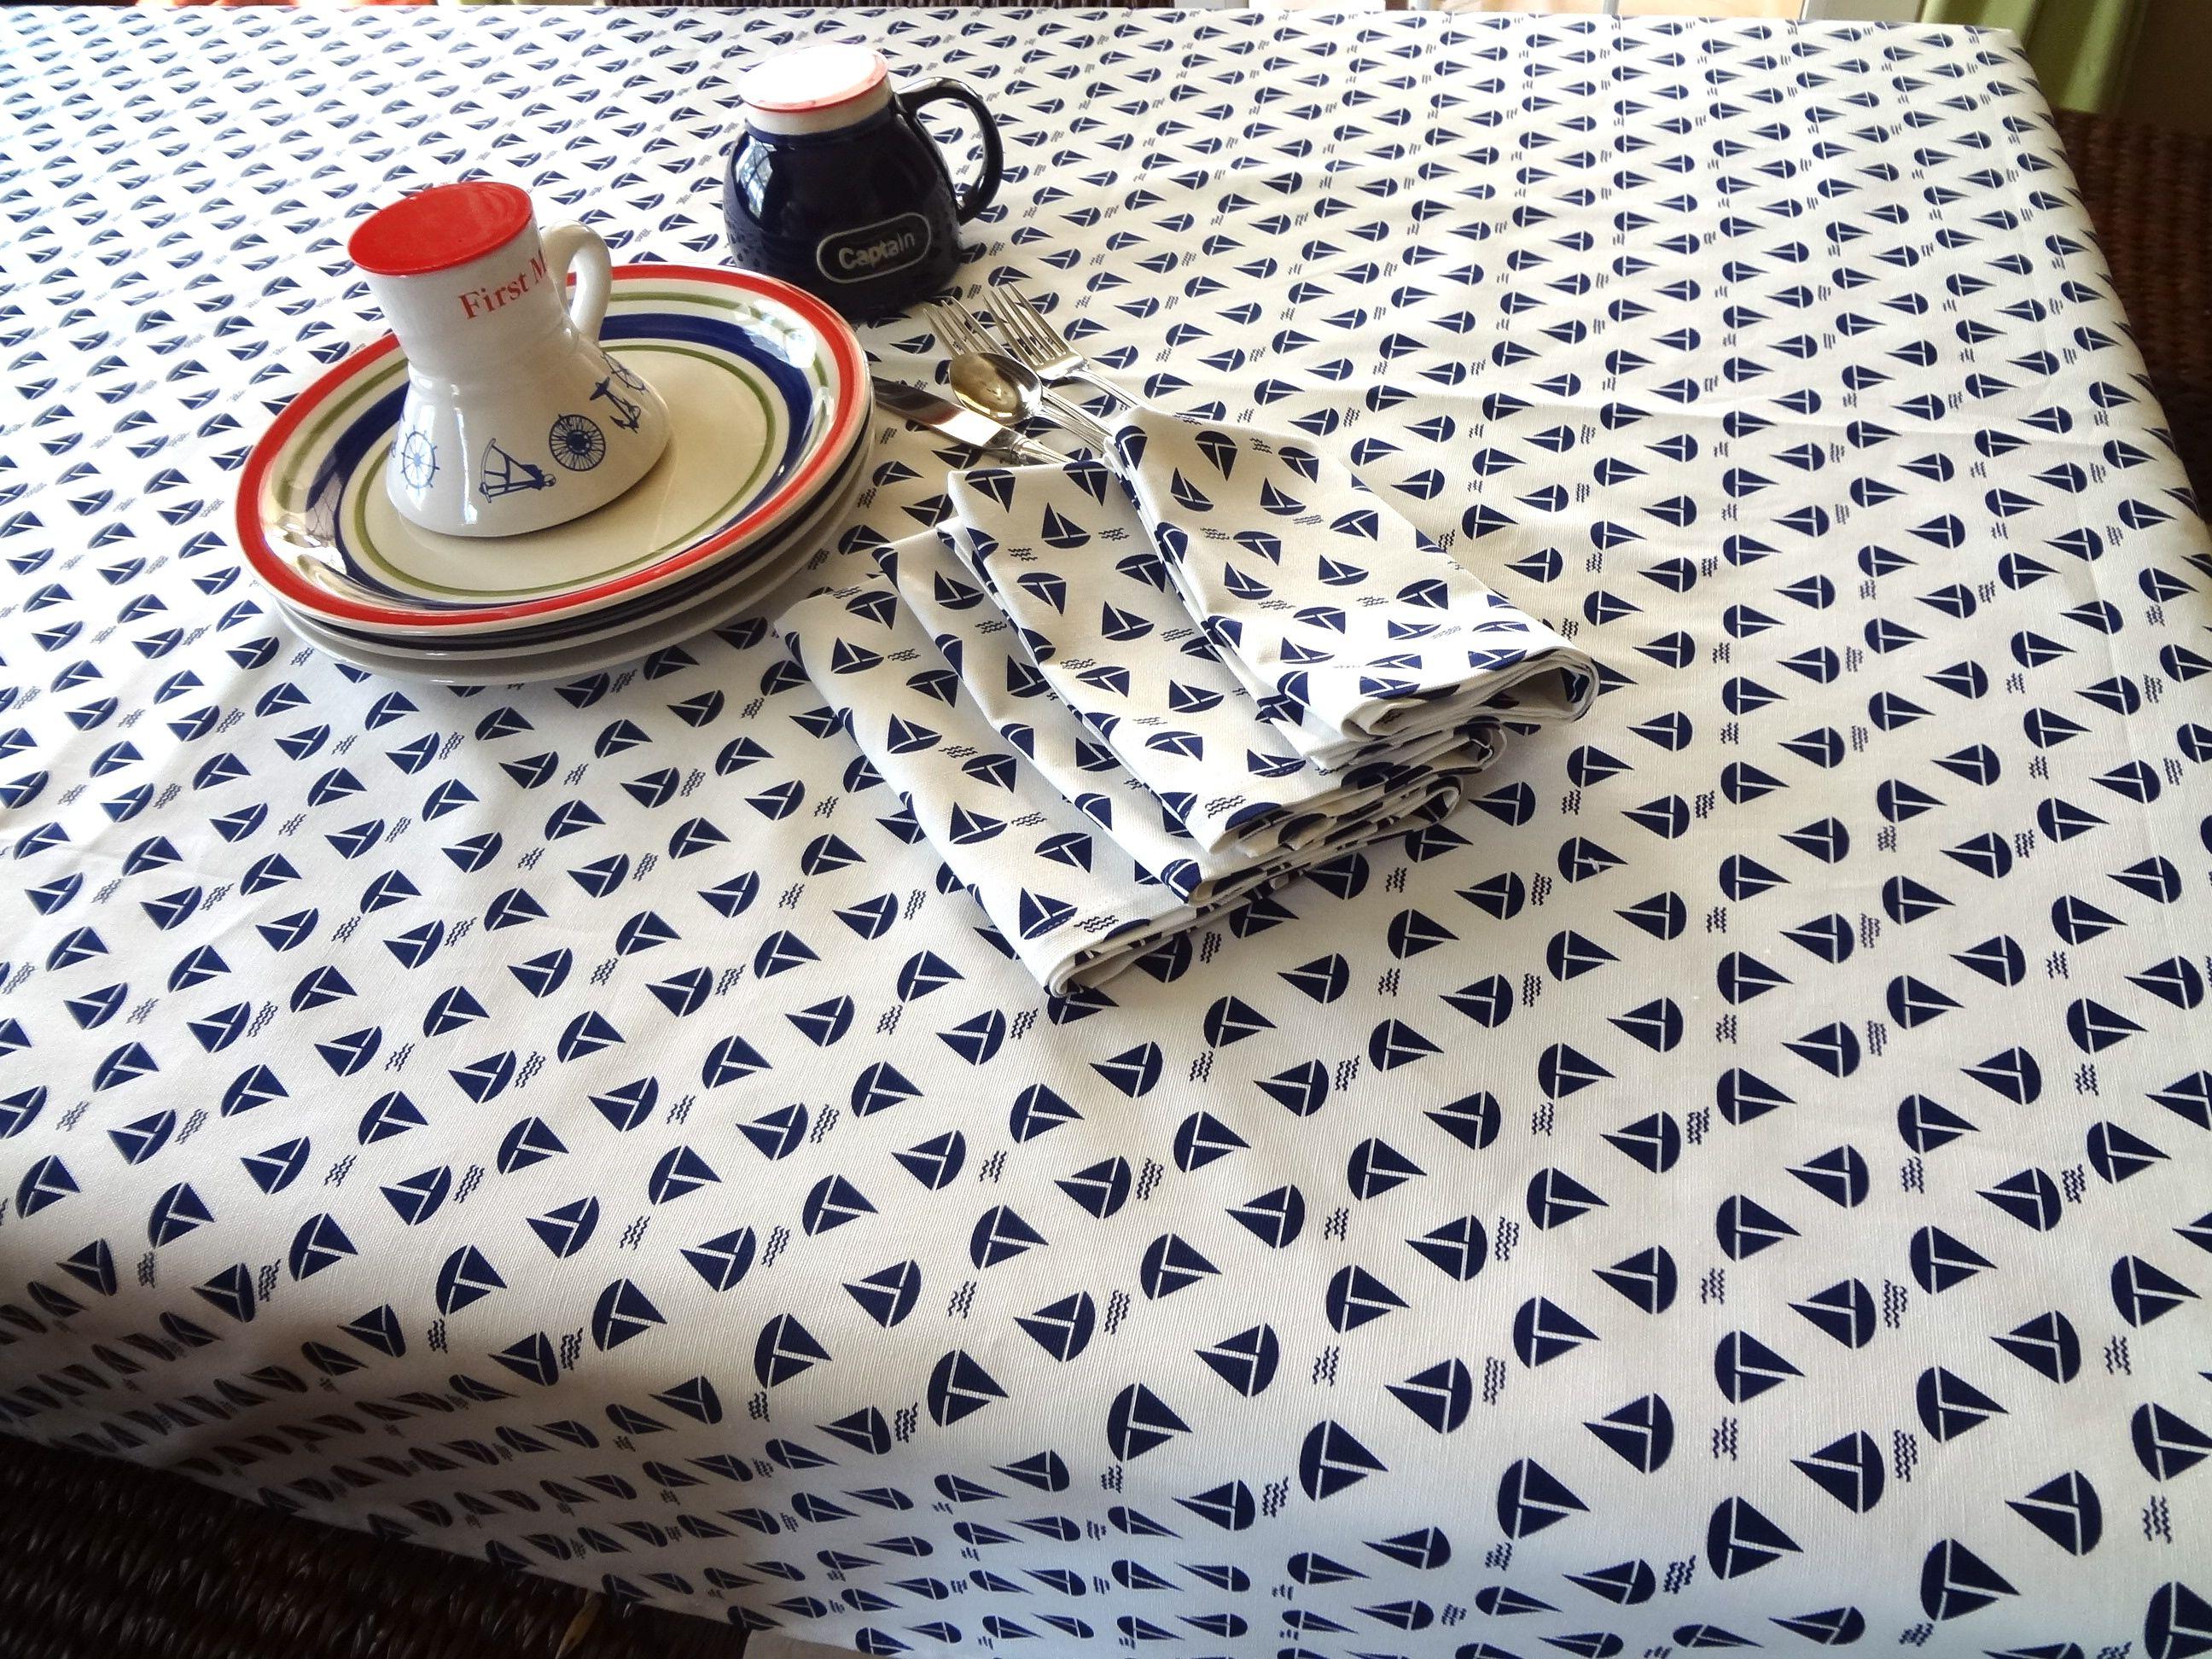 Nautical Tablecloth Www.modelshipsemporium.com